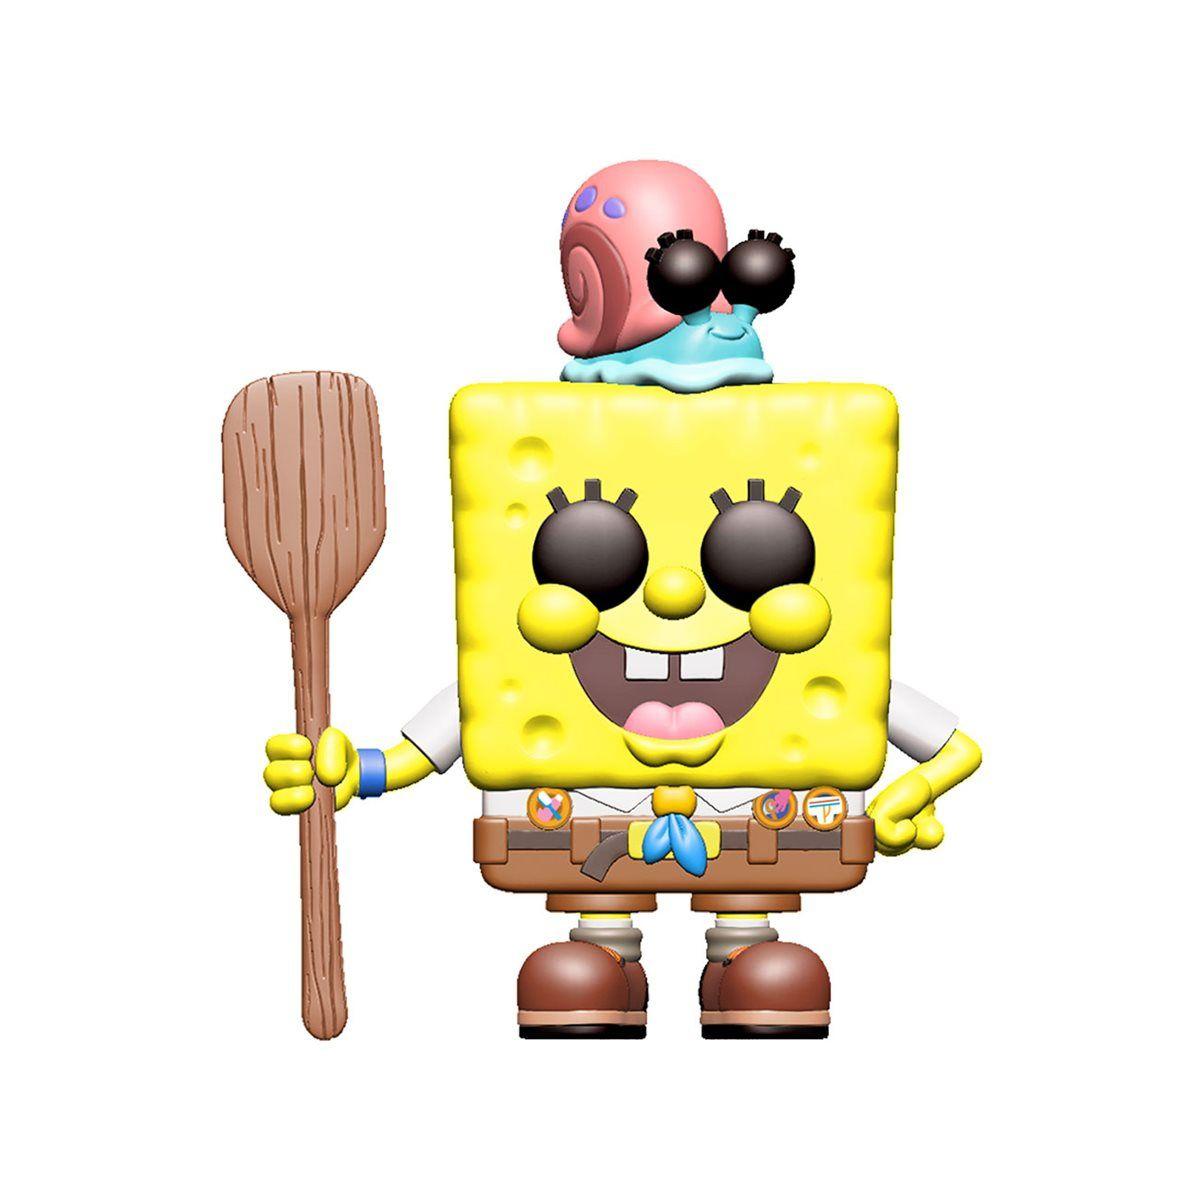 PRÉ VENDA: Funko Pop! Bob Esponja no Camping (Spongebob in Camping): Bob Esponja - O Incrível Resgate (Sponge On The Run) #916 - Funko